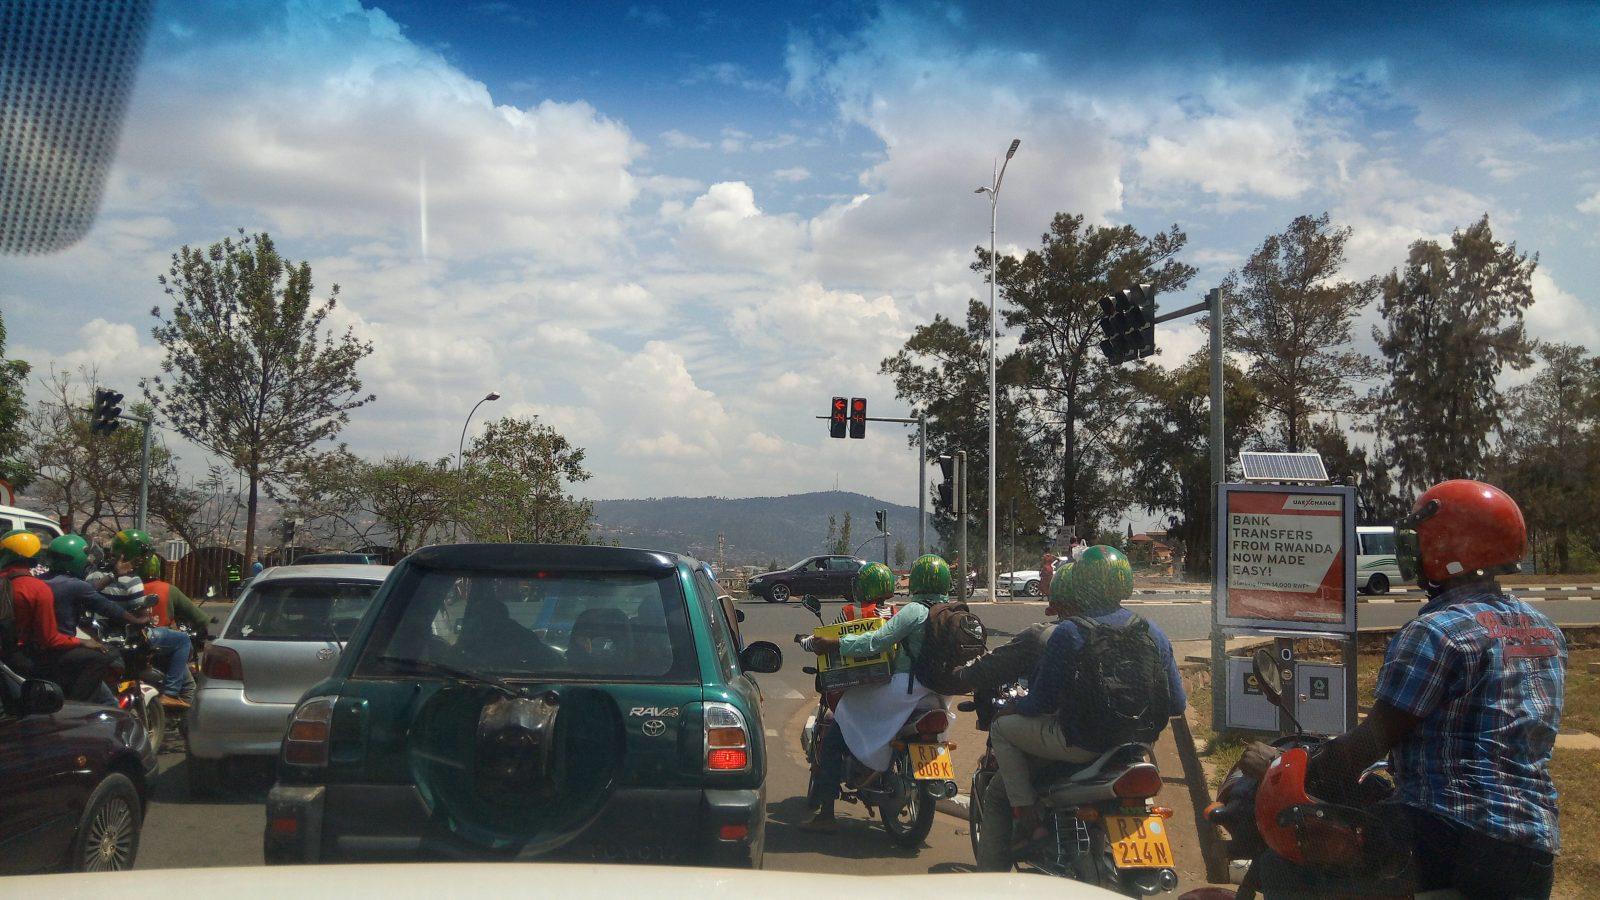 Scène de circulation à Kigali - Photo : Roger Mawulolo